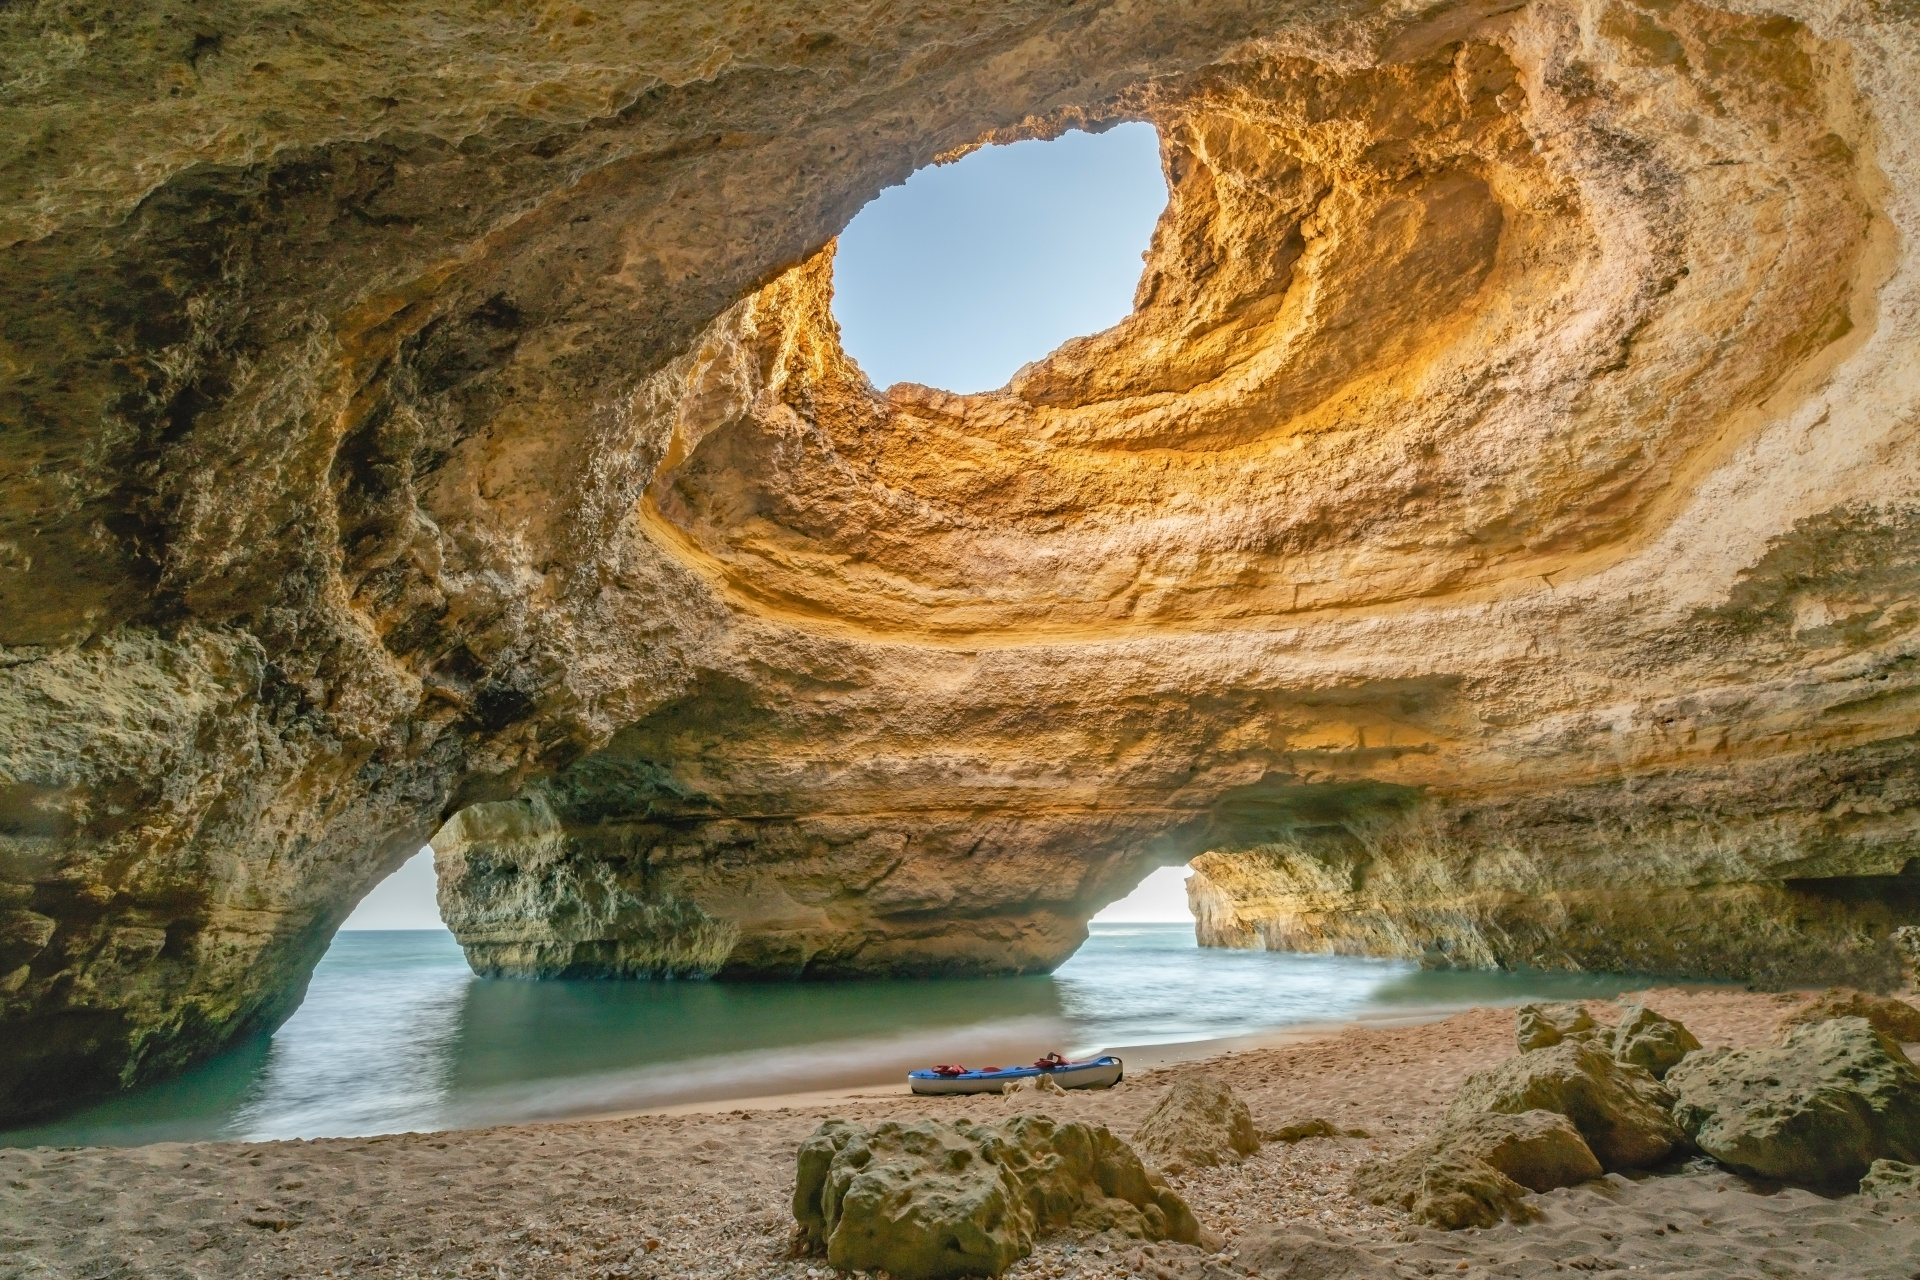 benagil-cave-algarve-portugal